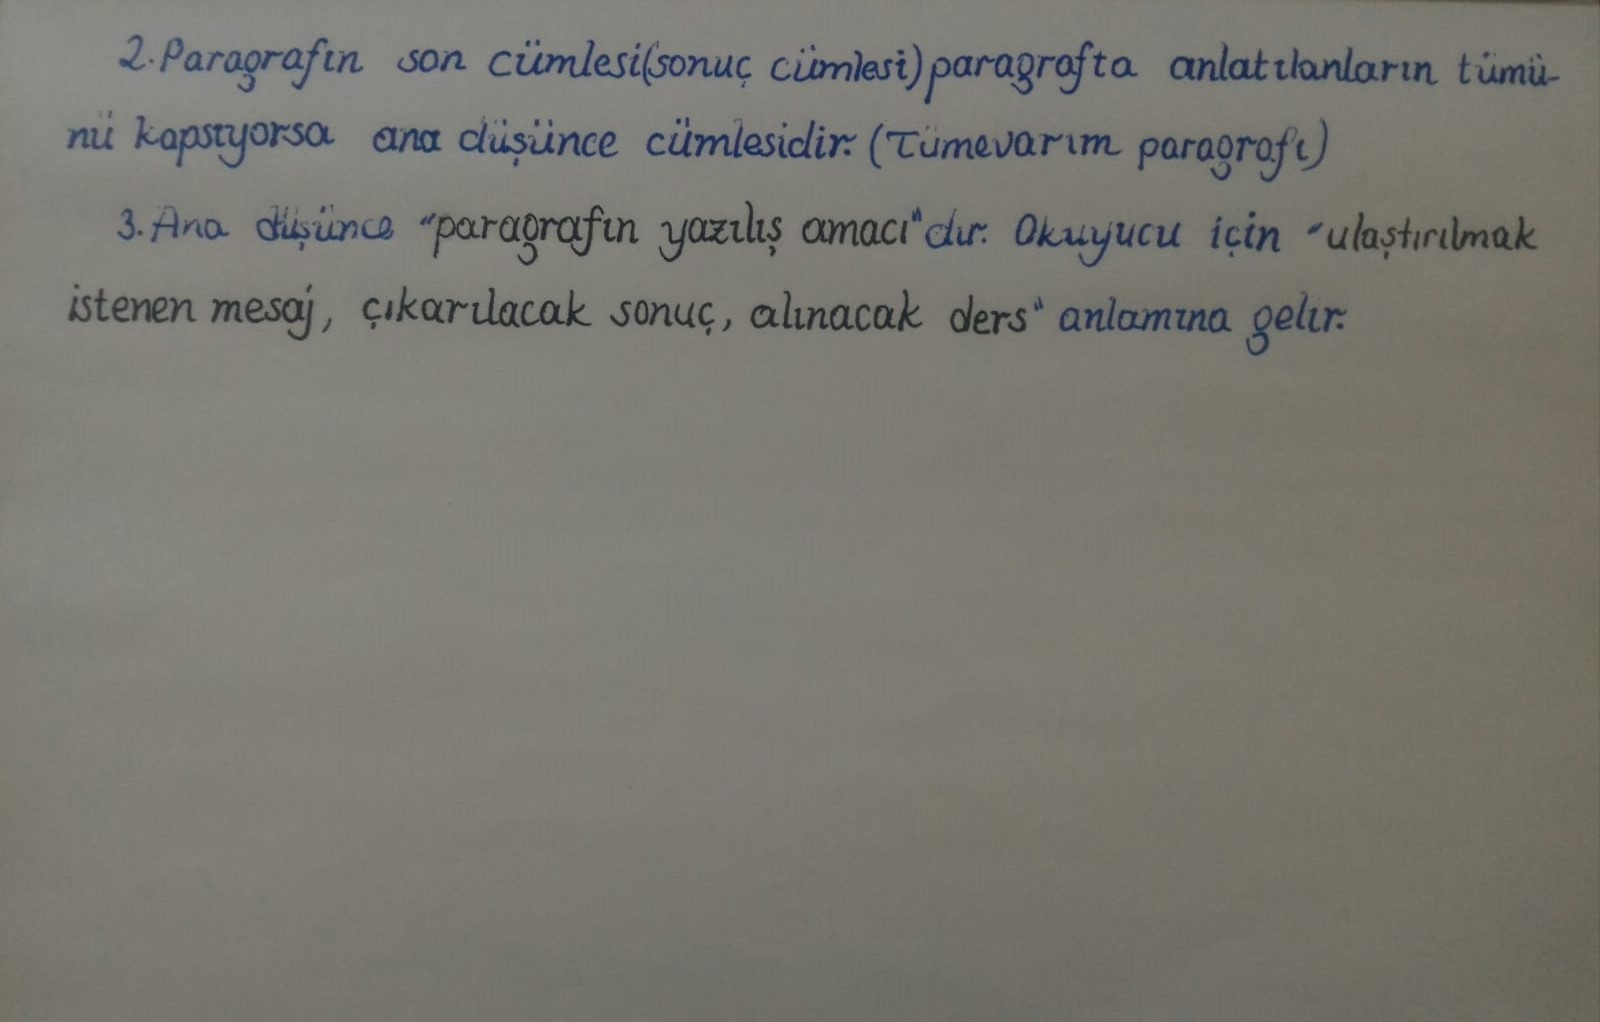 Paragrafta_konu_1